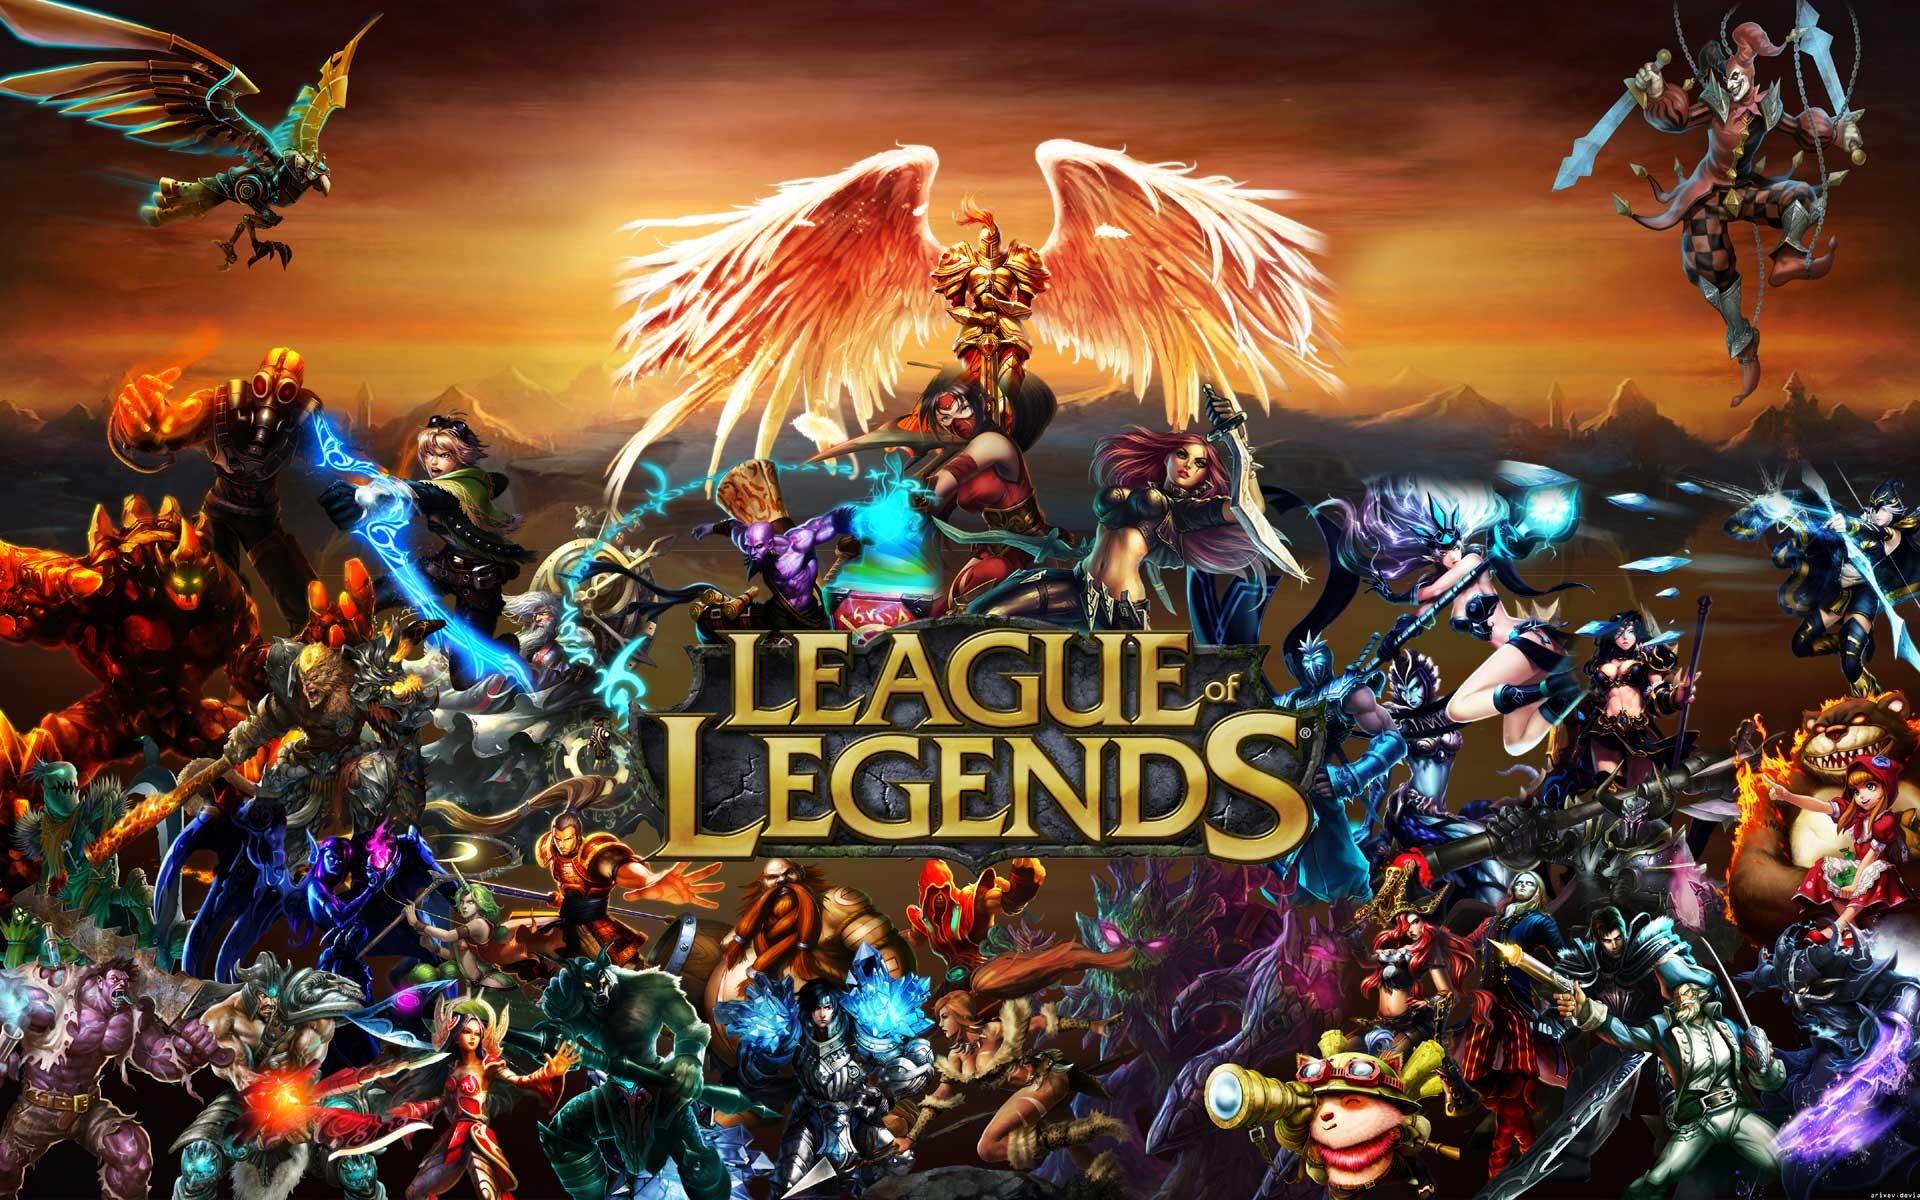 League Of Legends Wallpaper For Desktop 14 High Definition Wallpapers HD